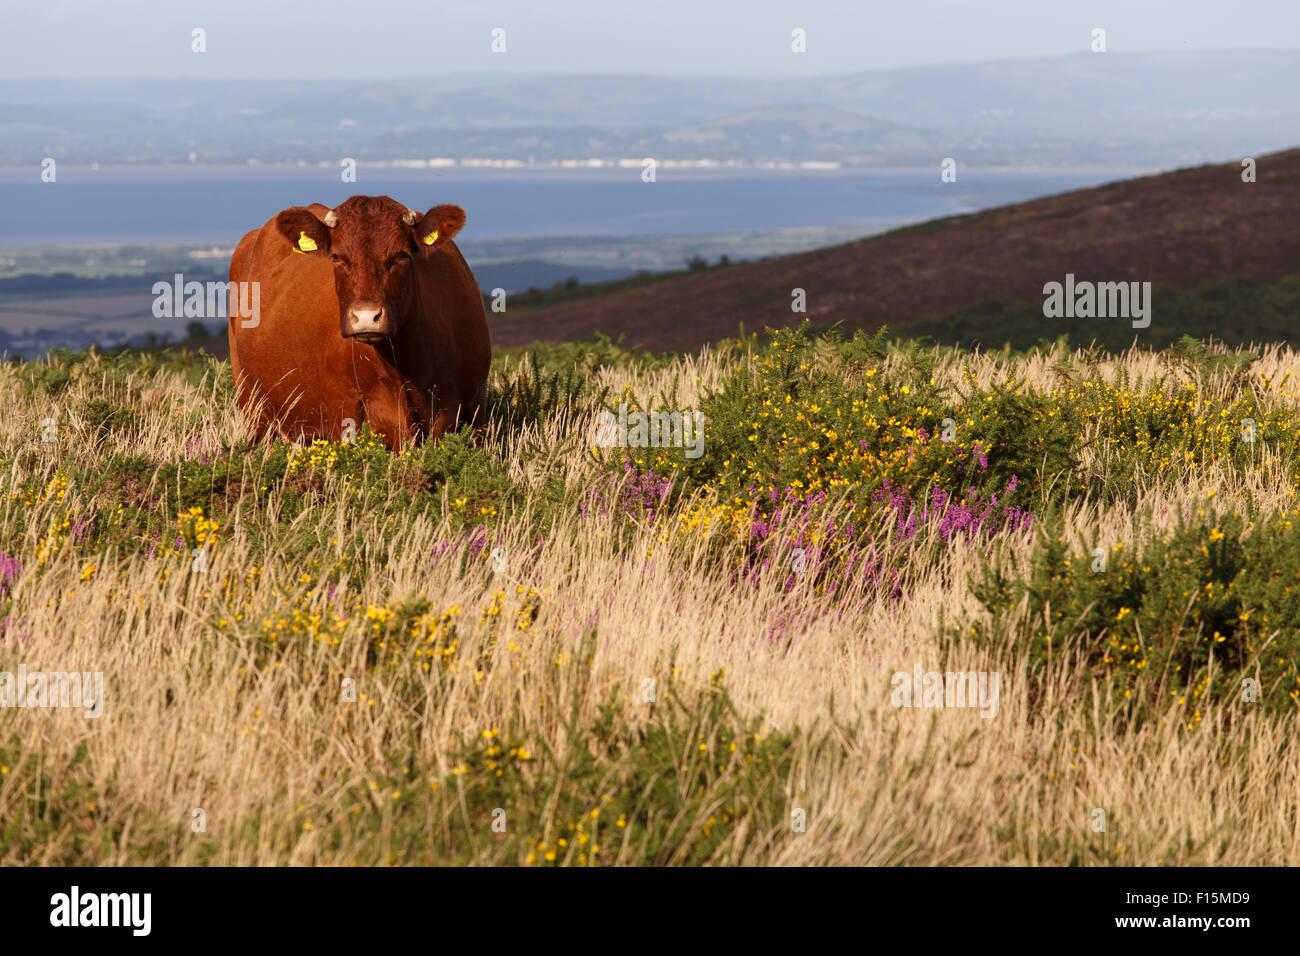 Red Devon cattle grazing, free range, on the Quantock hills. - Stock Image